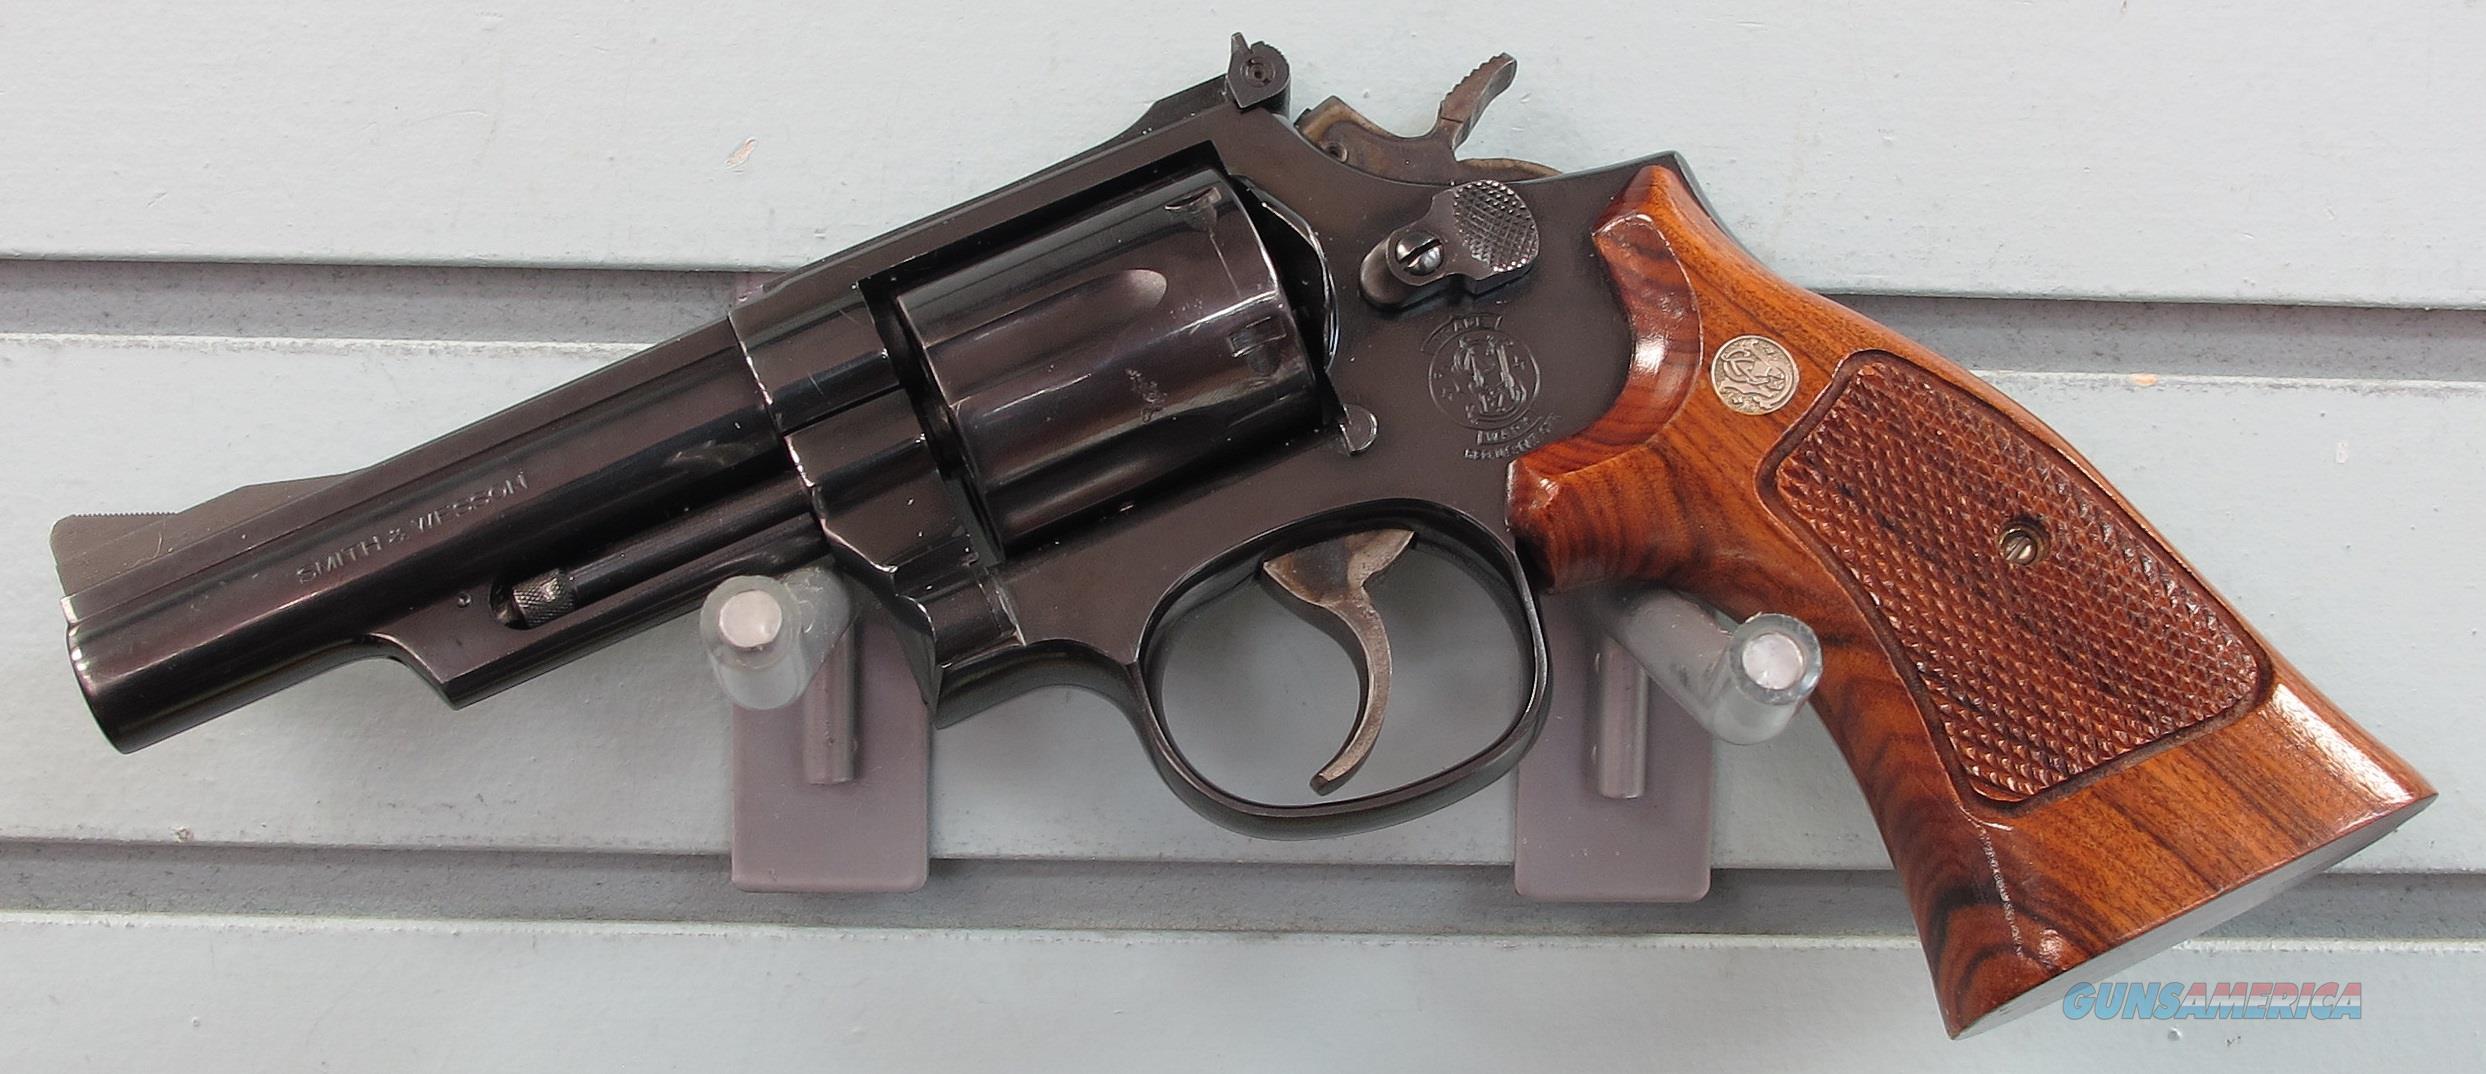 SMITH & WESSON MODEL 19-6 357 MAGNUM REVOLVER  Guns > Pistols > Smith & Wesson Revolvers > Med. Frame ( K/L )